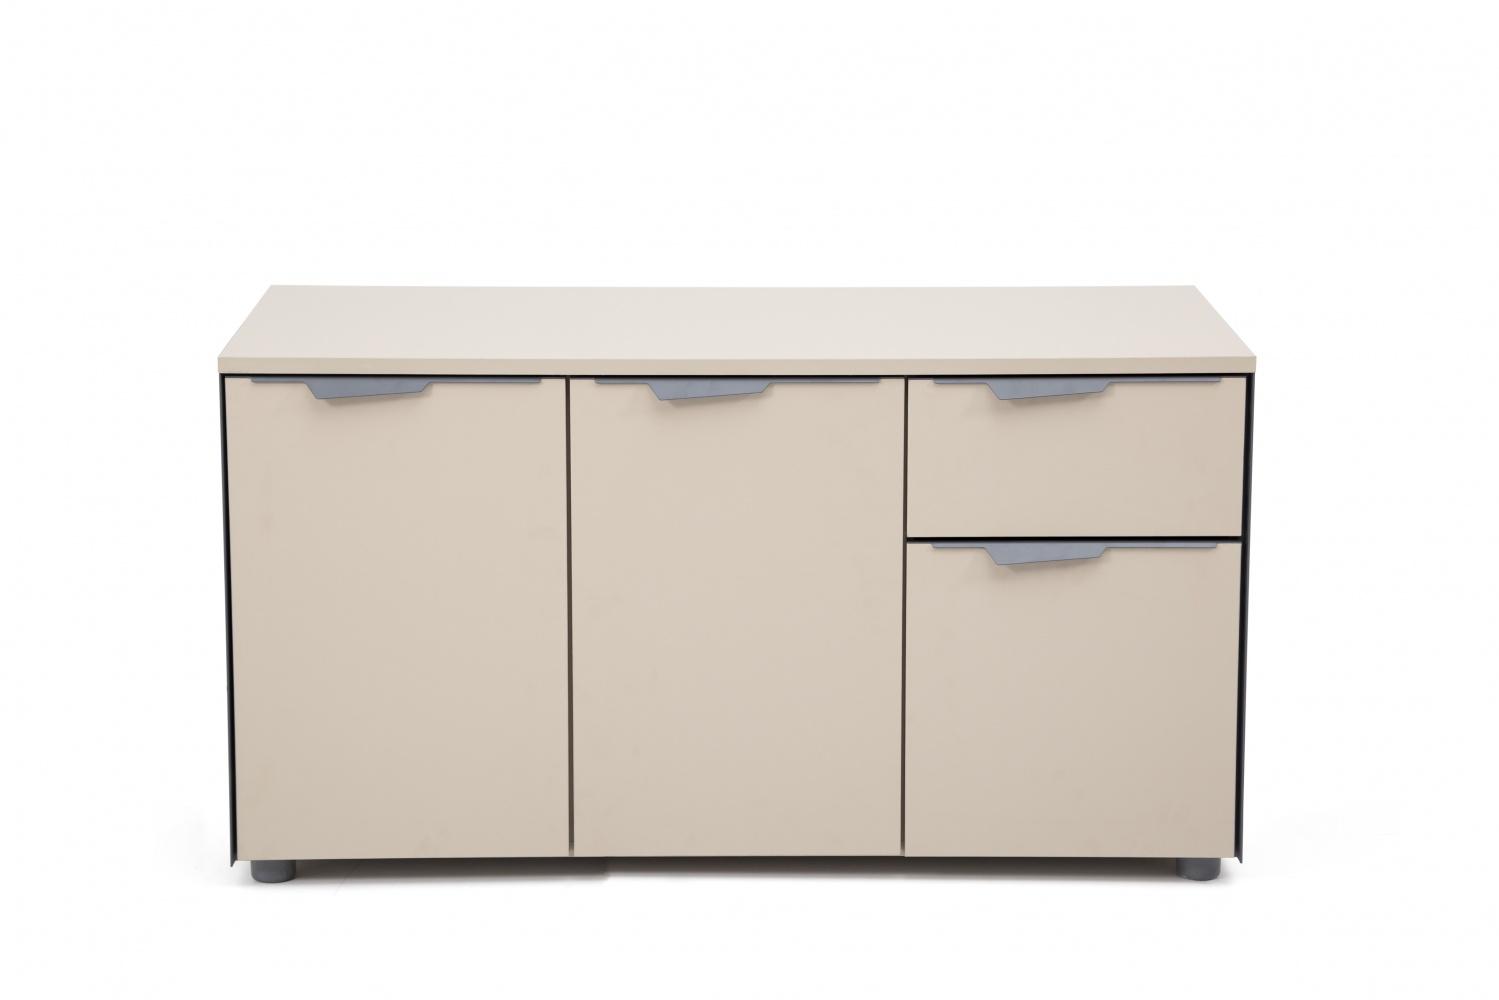 Ovali Büro Sideboard 3-türig Curve L3 Beige Grau